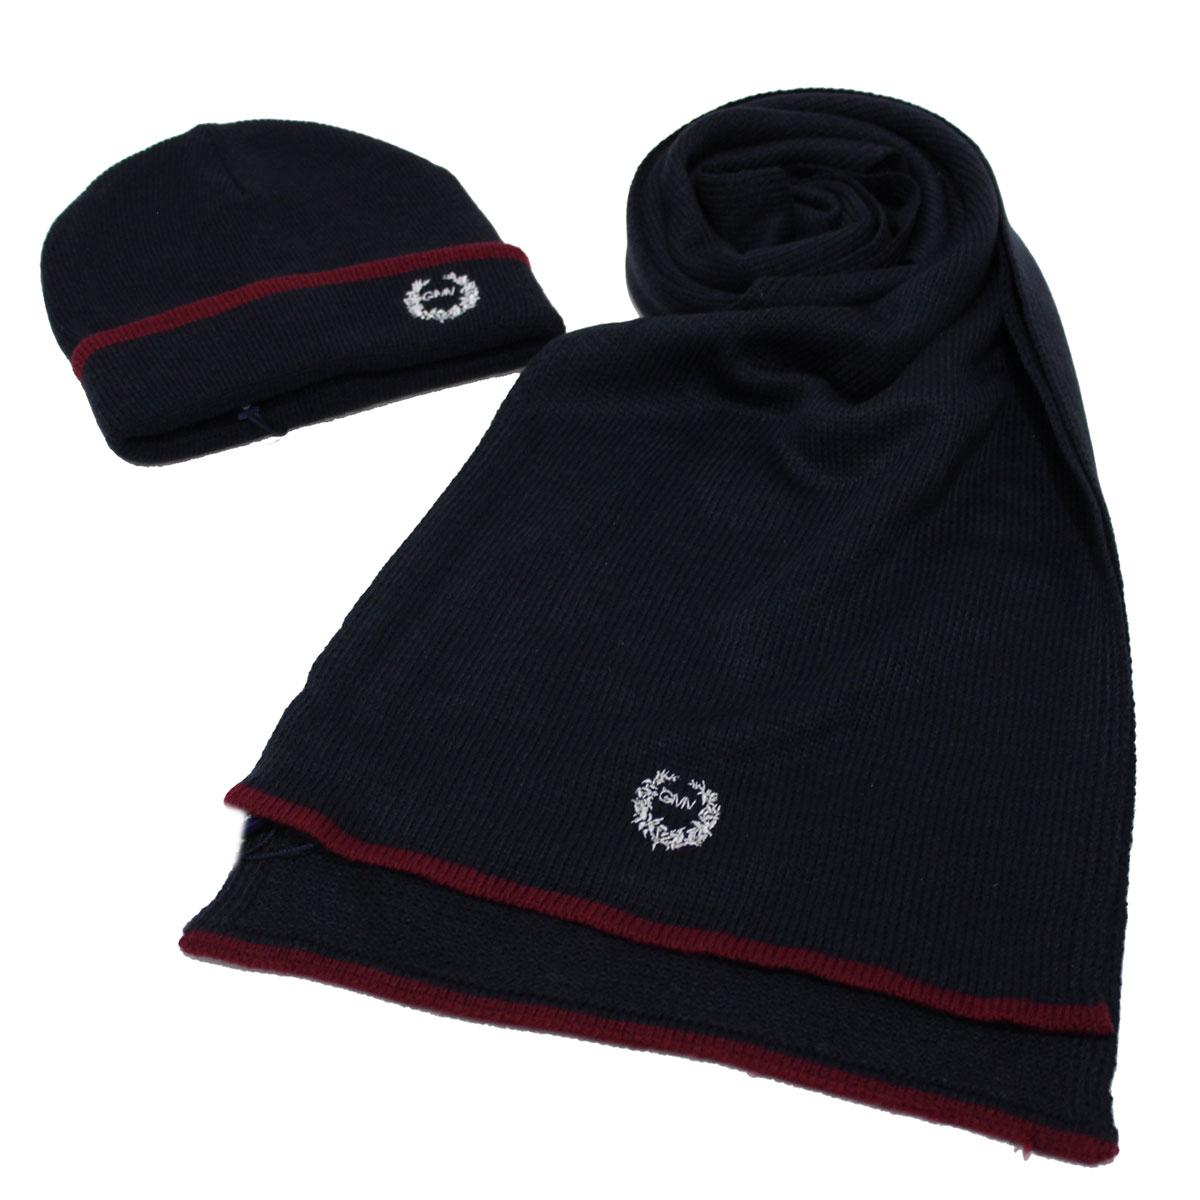 Men s acrylic hat and scarf set 100% acrylic in box Gian Marco Venturi  71763 blu 67ee6f77e21a